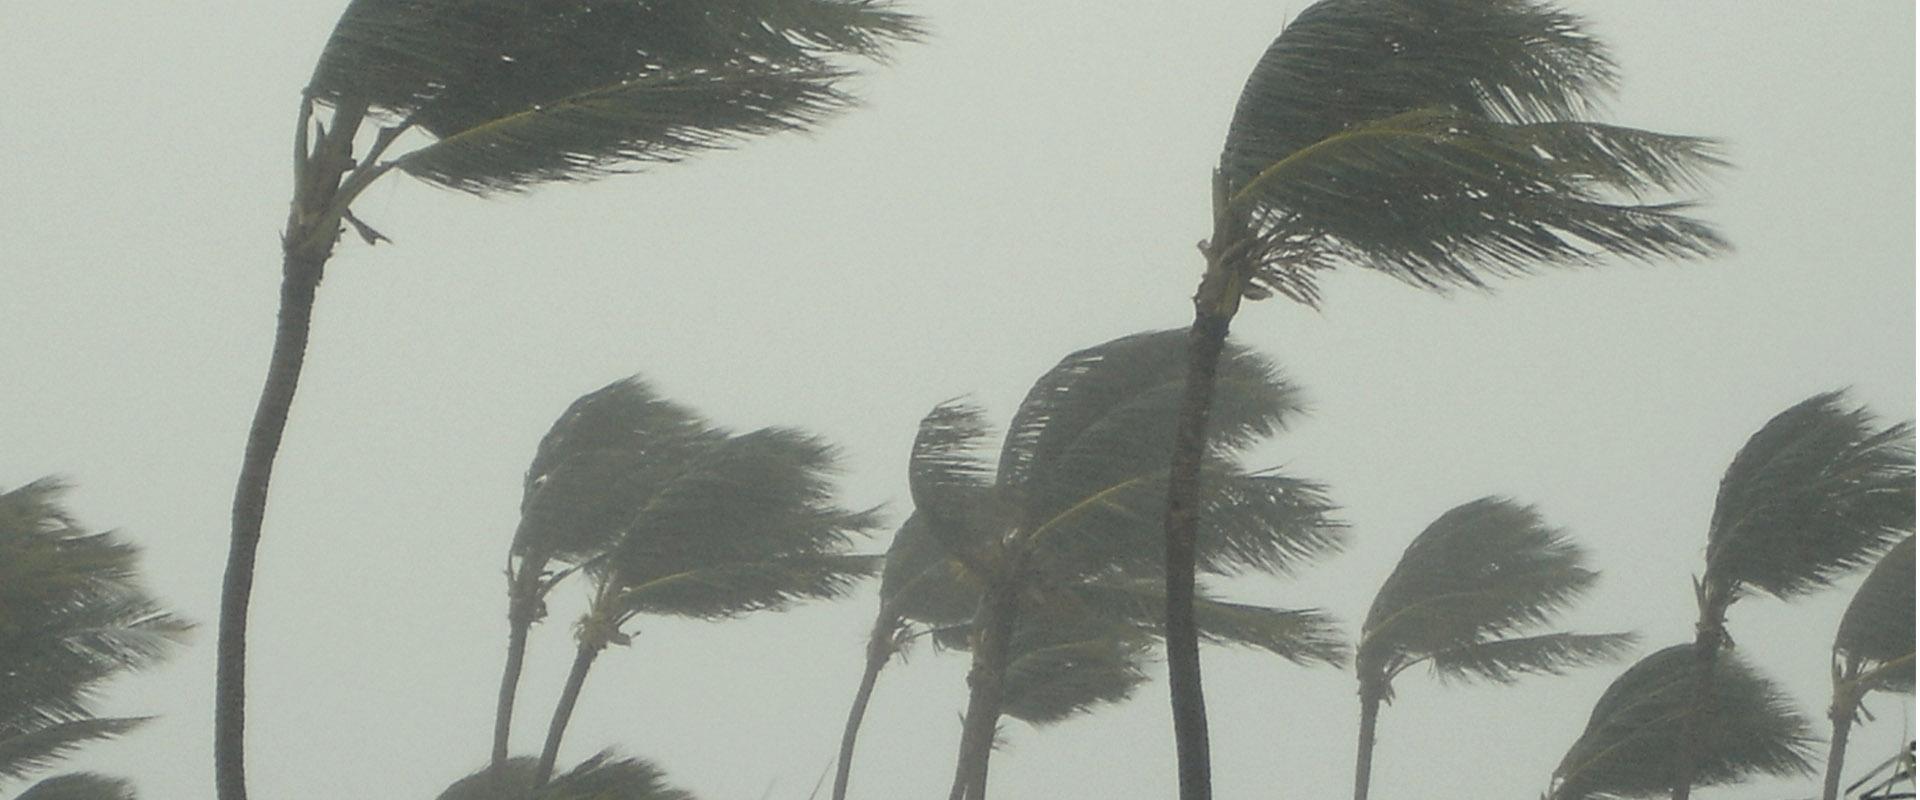 storage storm coverage